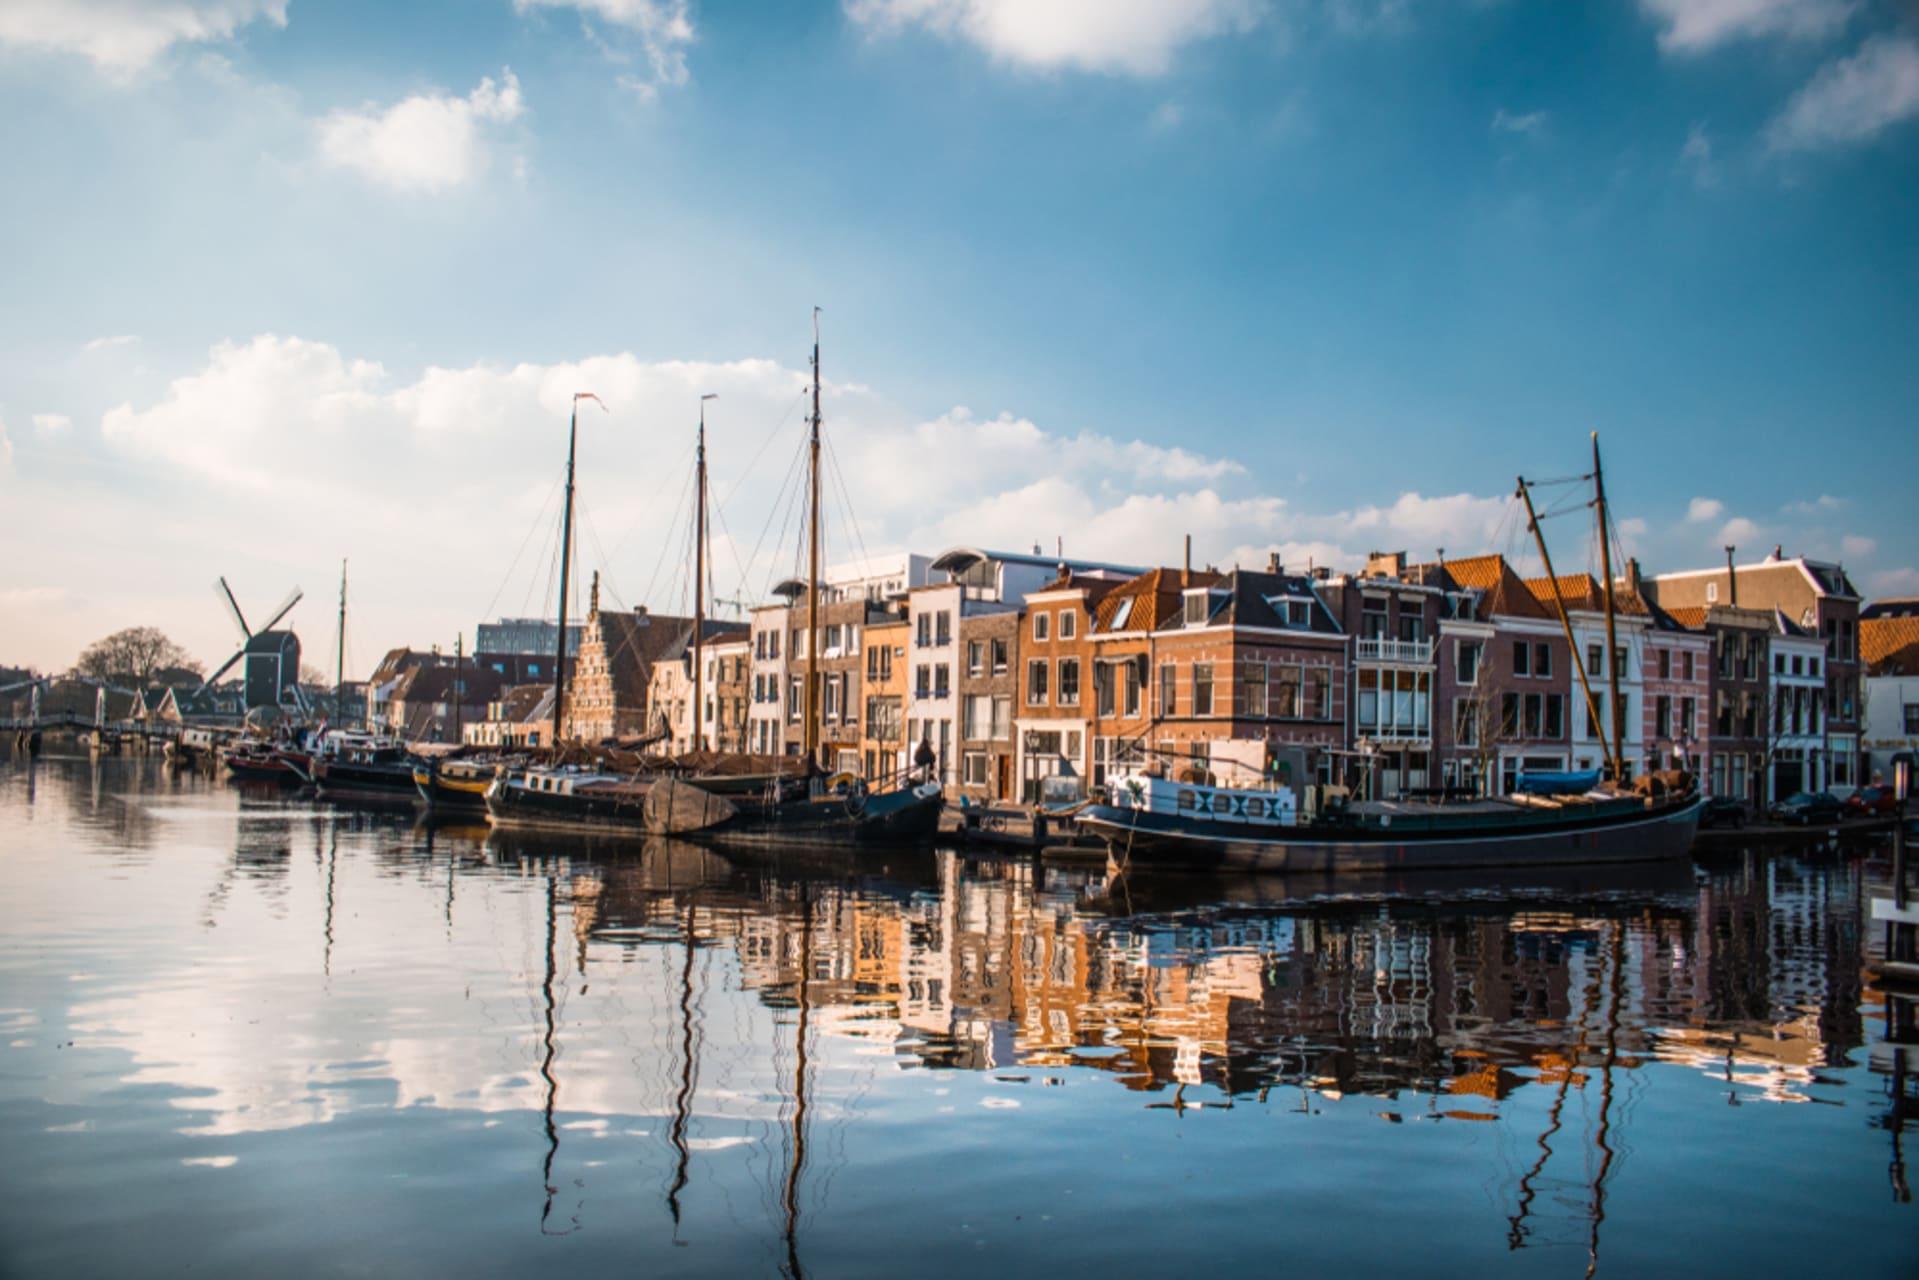 Leiden cover image